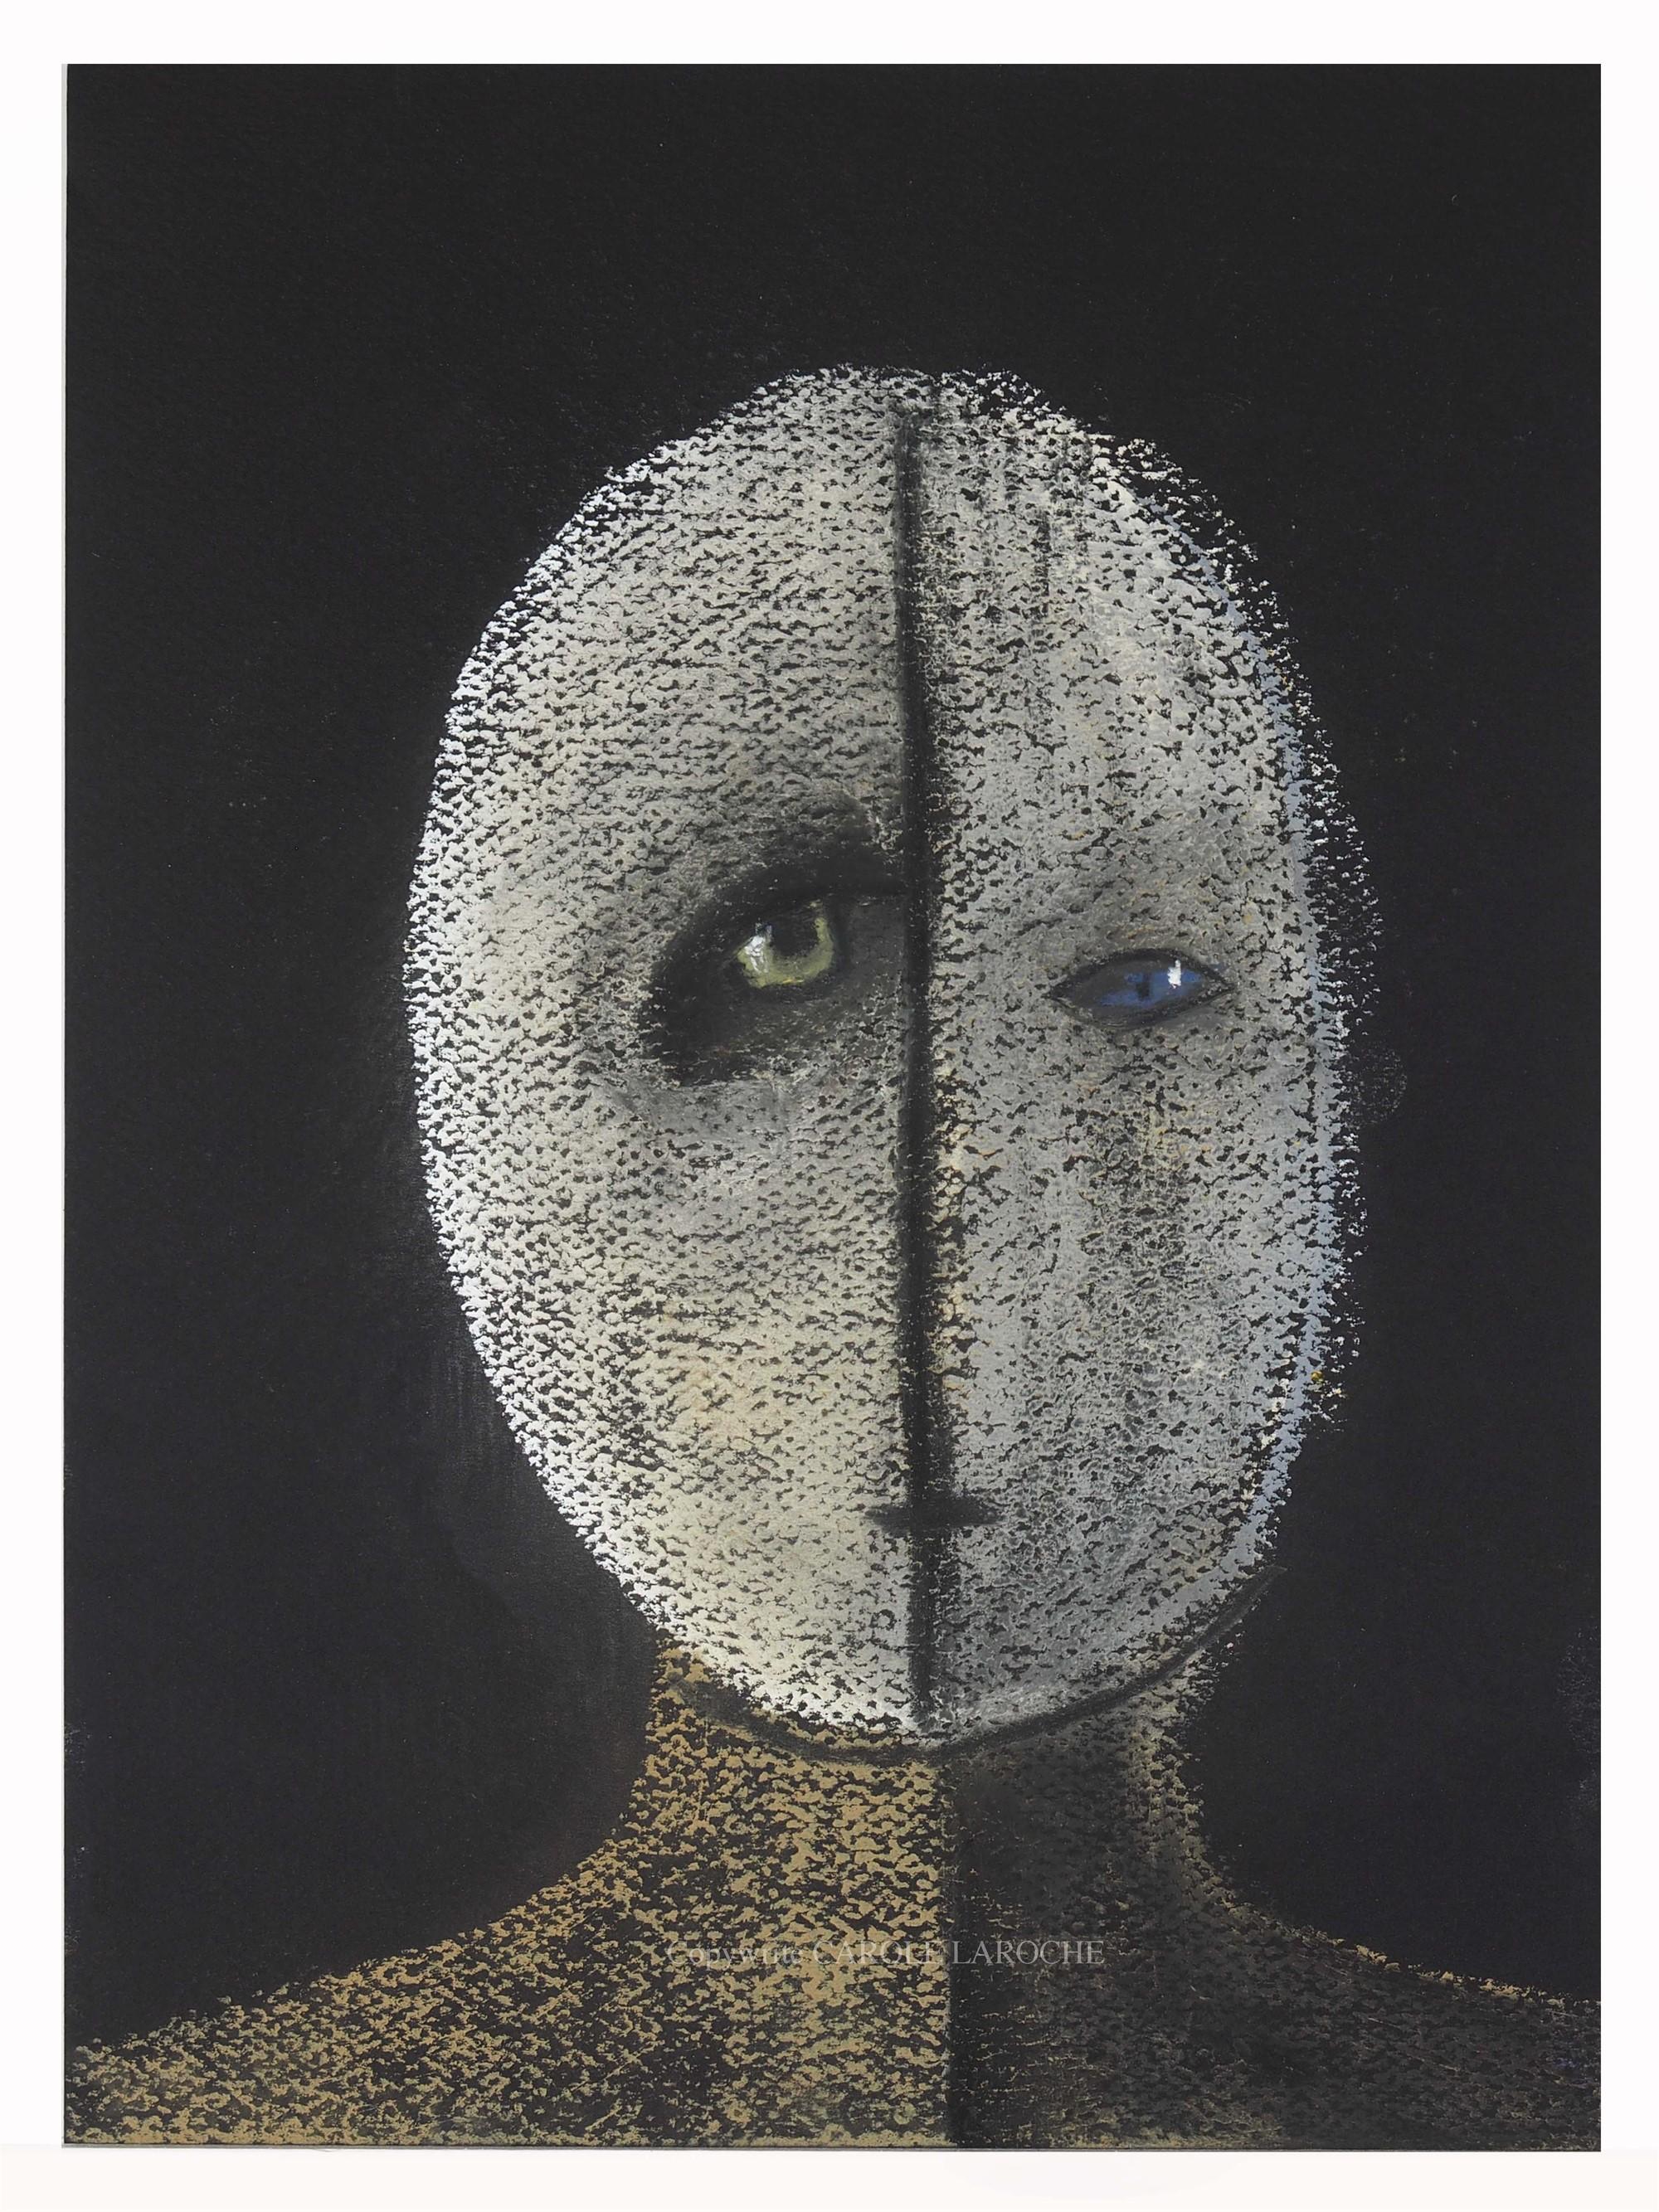 ANCIENT MESSENGER by Carole LaRoche